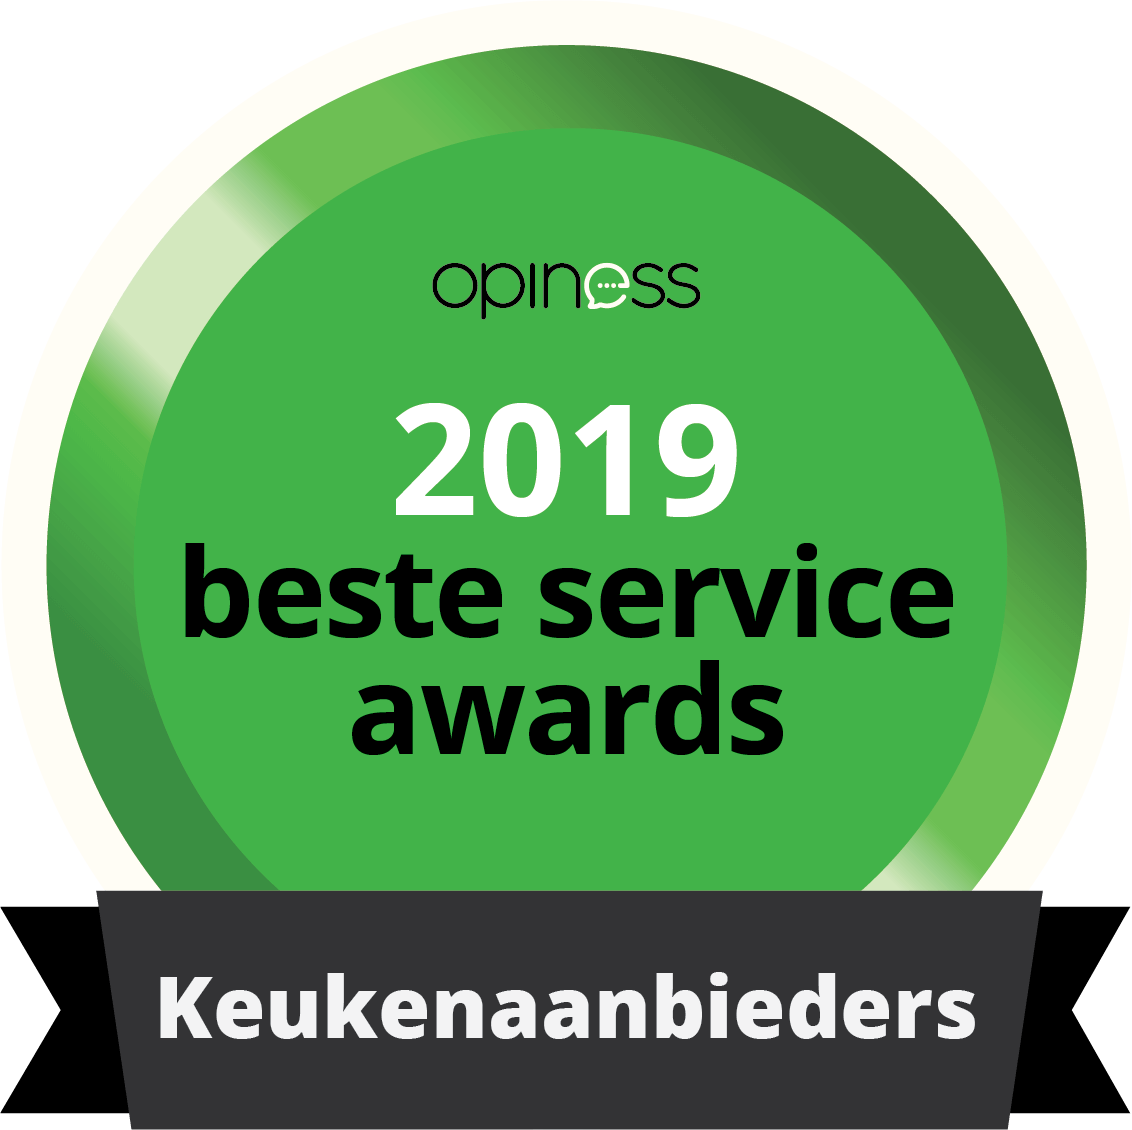 Tieleman Keukens Beste Service Awards 2019 winnaar